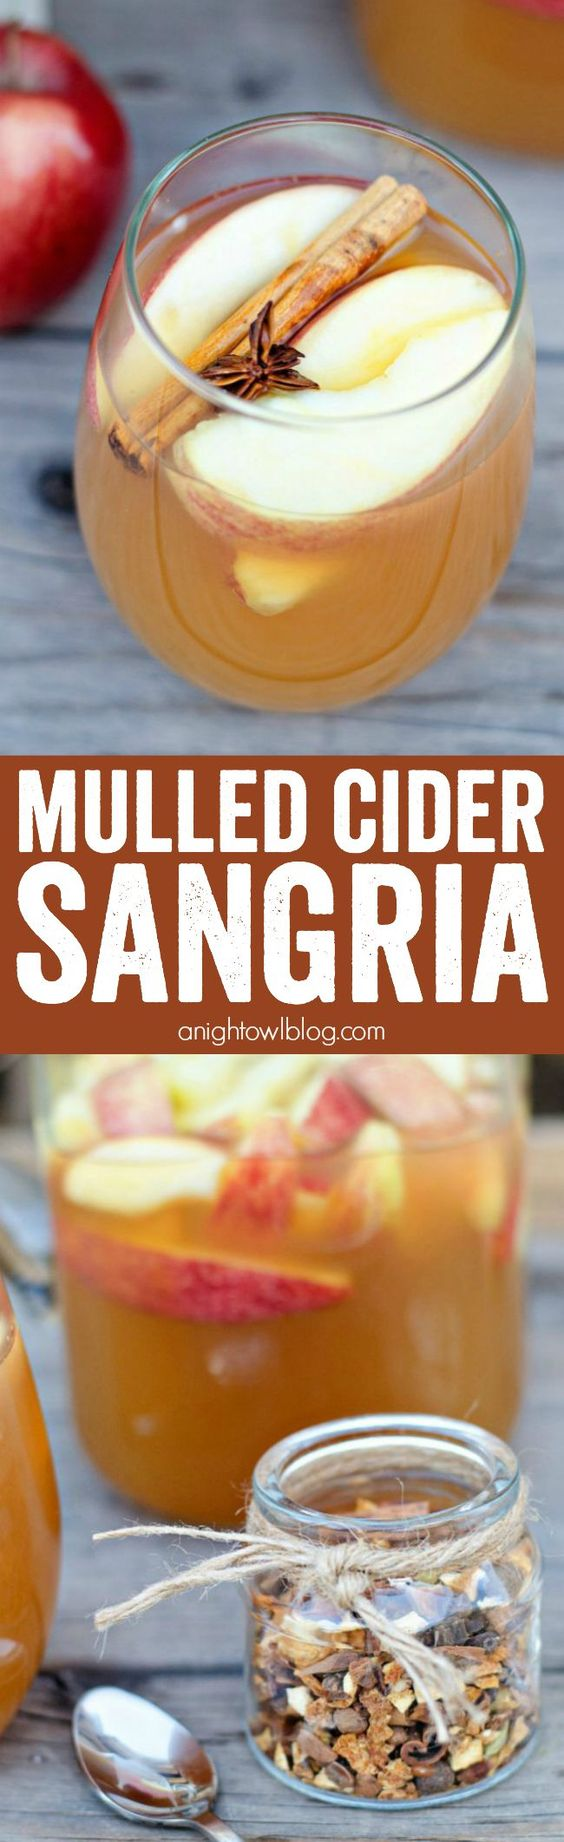 Mulled Apple Cider Sangria   Recipe   Muslin bags, Apple ...